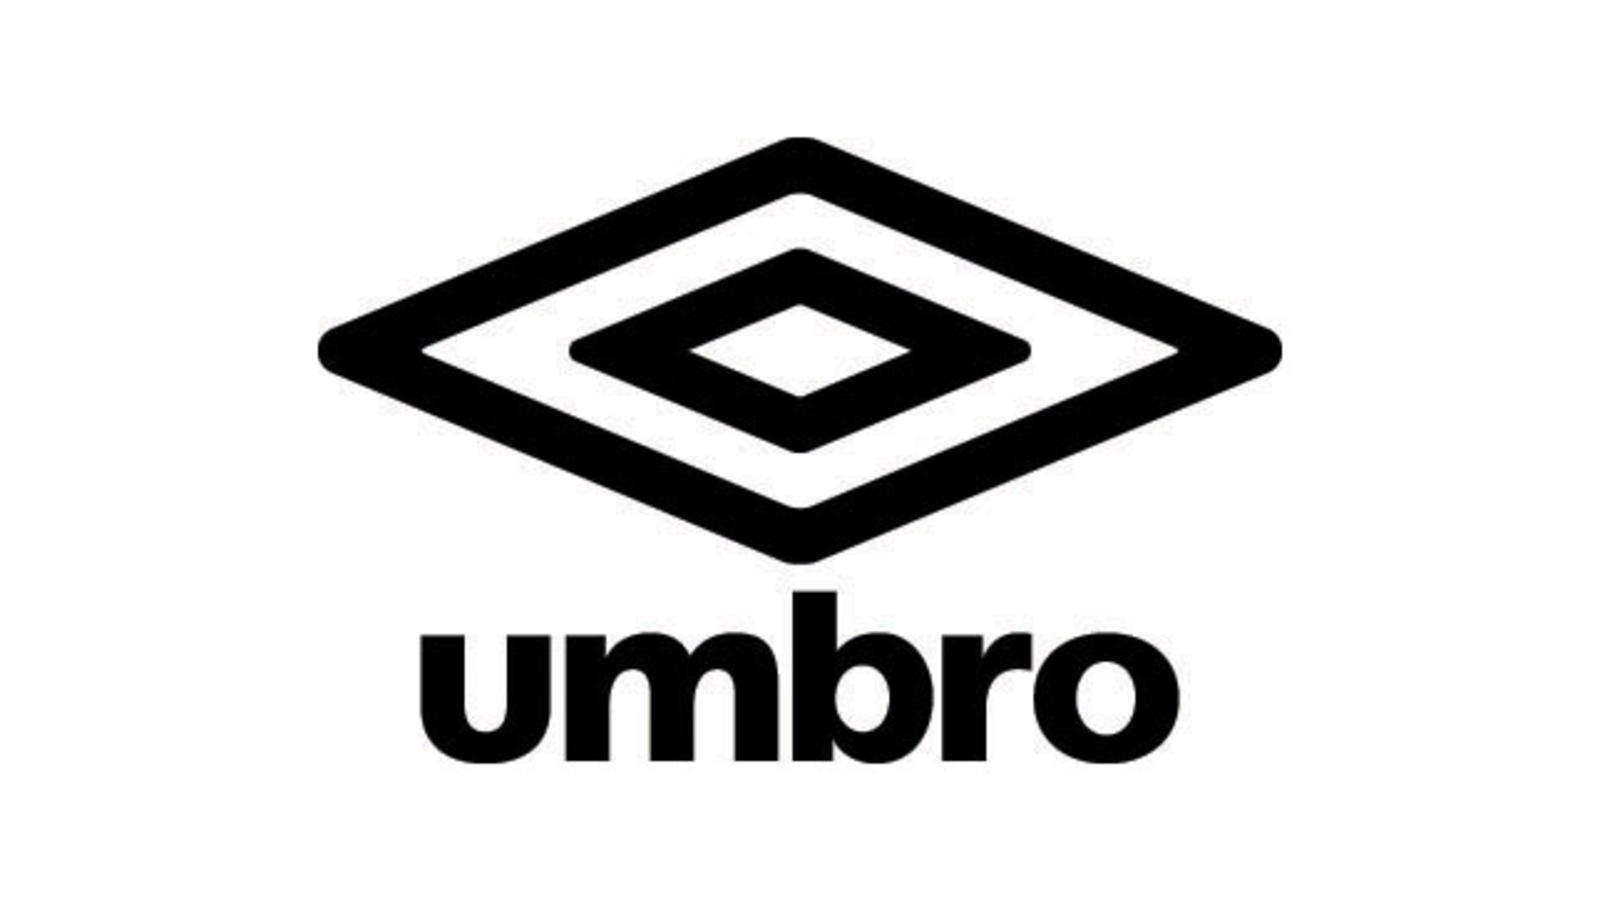 Nike News - NIKE, INC. Announces Sale of Umbro to Iconix Brand Group